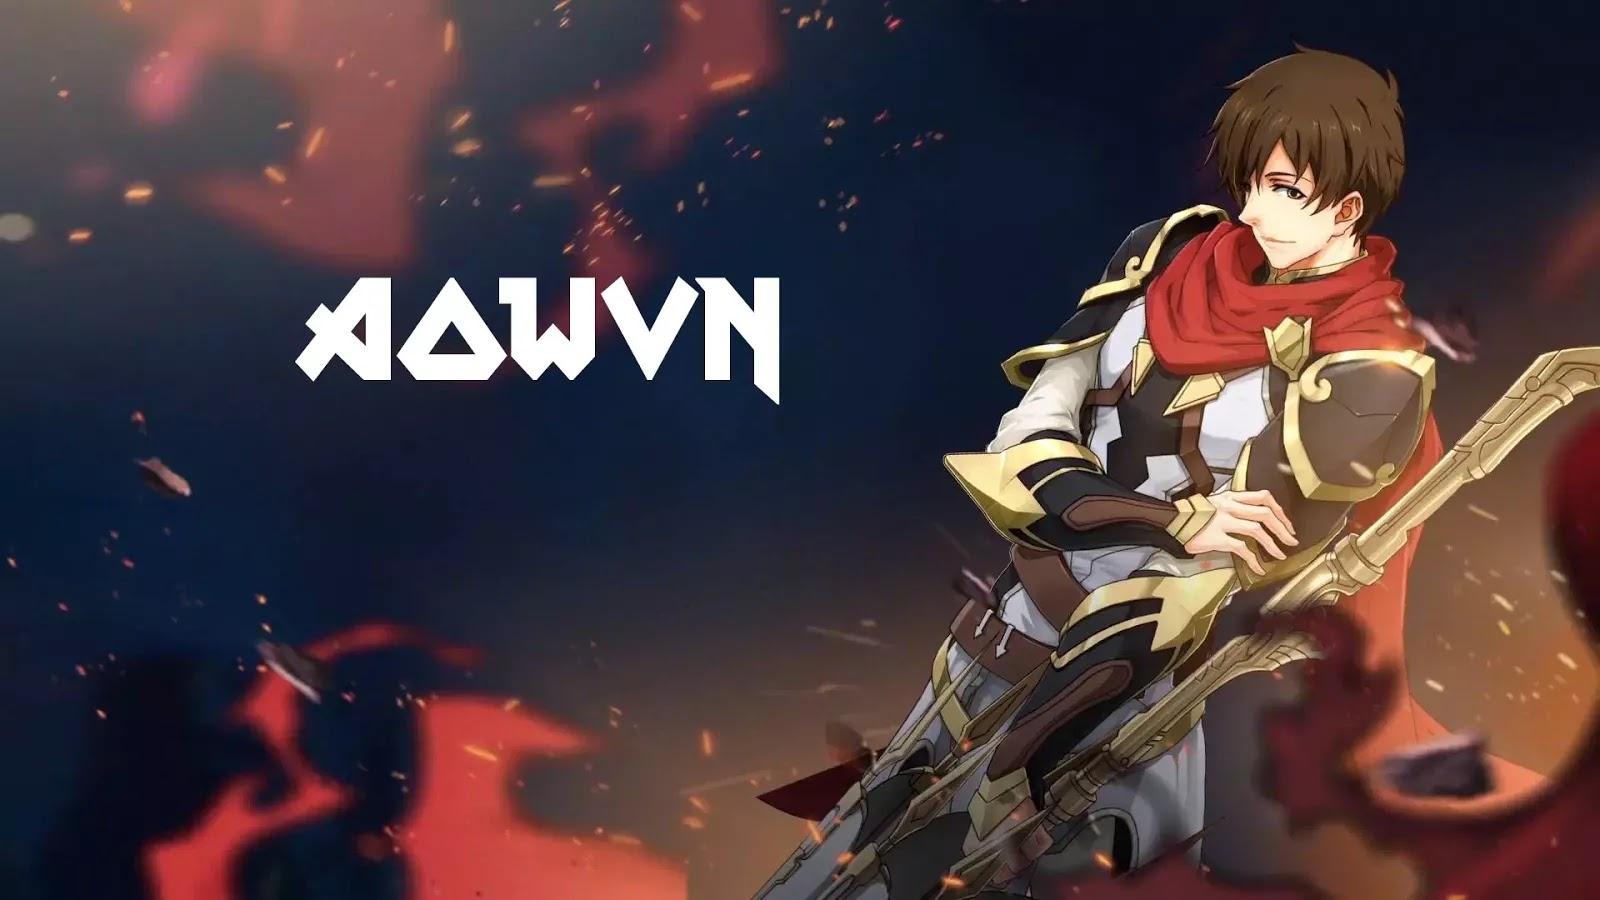 toan chuc cao thu aowvn - [ Anime 3gp Mp4 ] Toàn Chức Cao Thủ   Vietsub - Hấp Dẫn